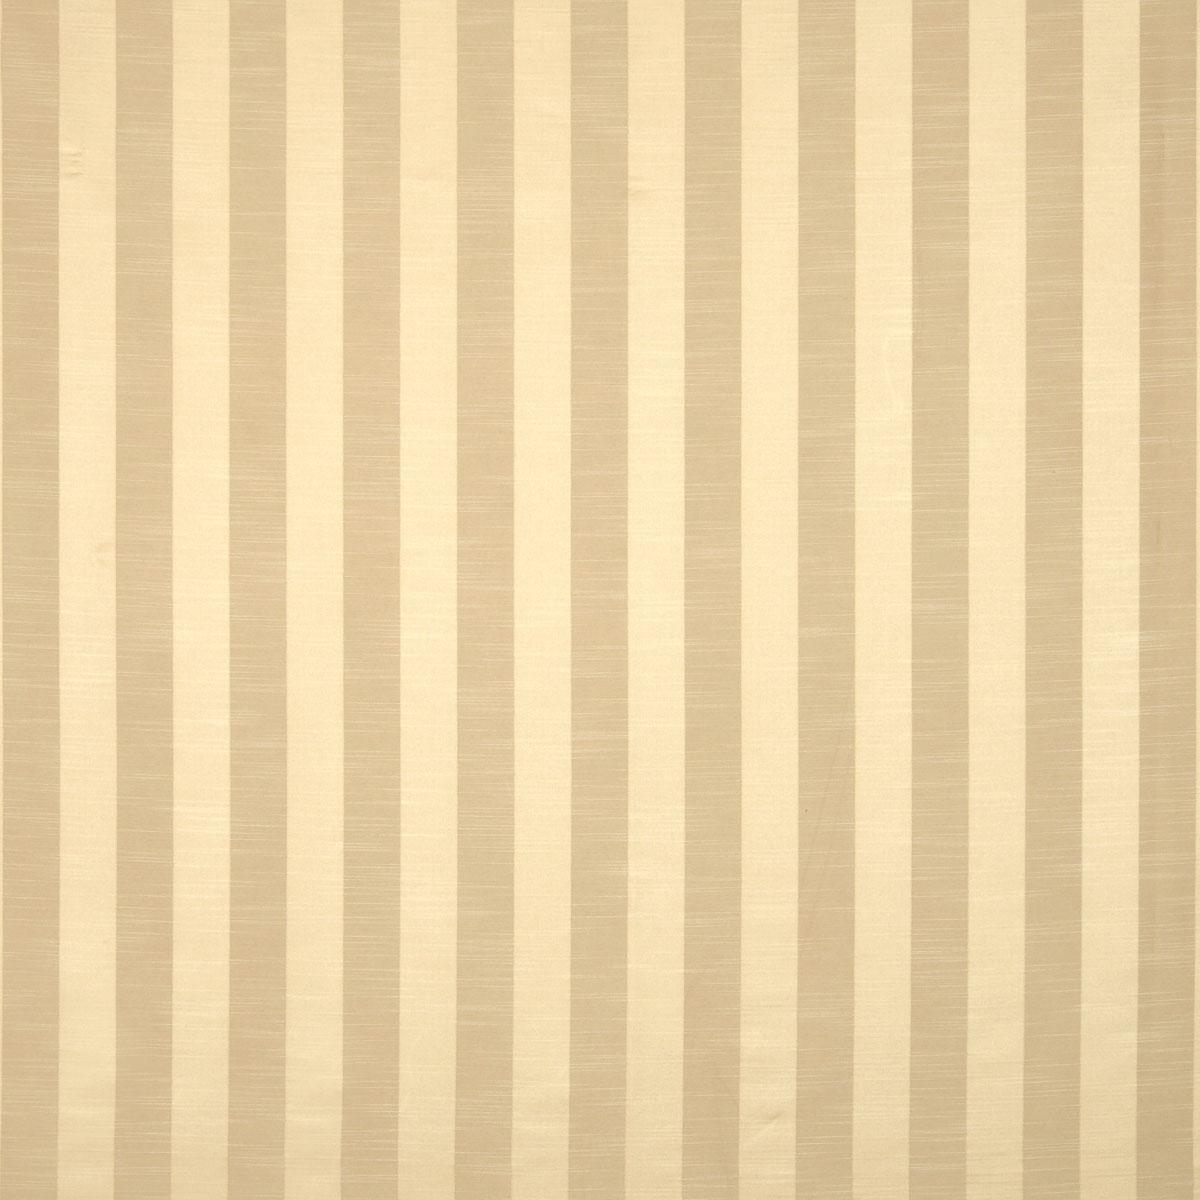 Antique Ascot Stripe Curtain Fabric